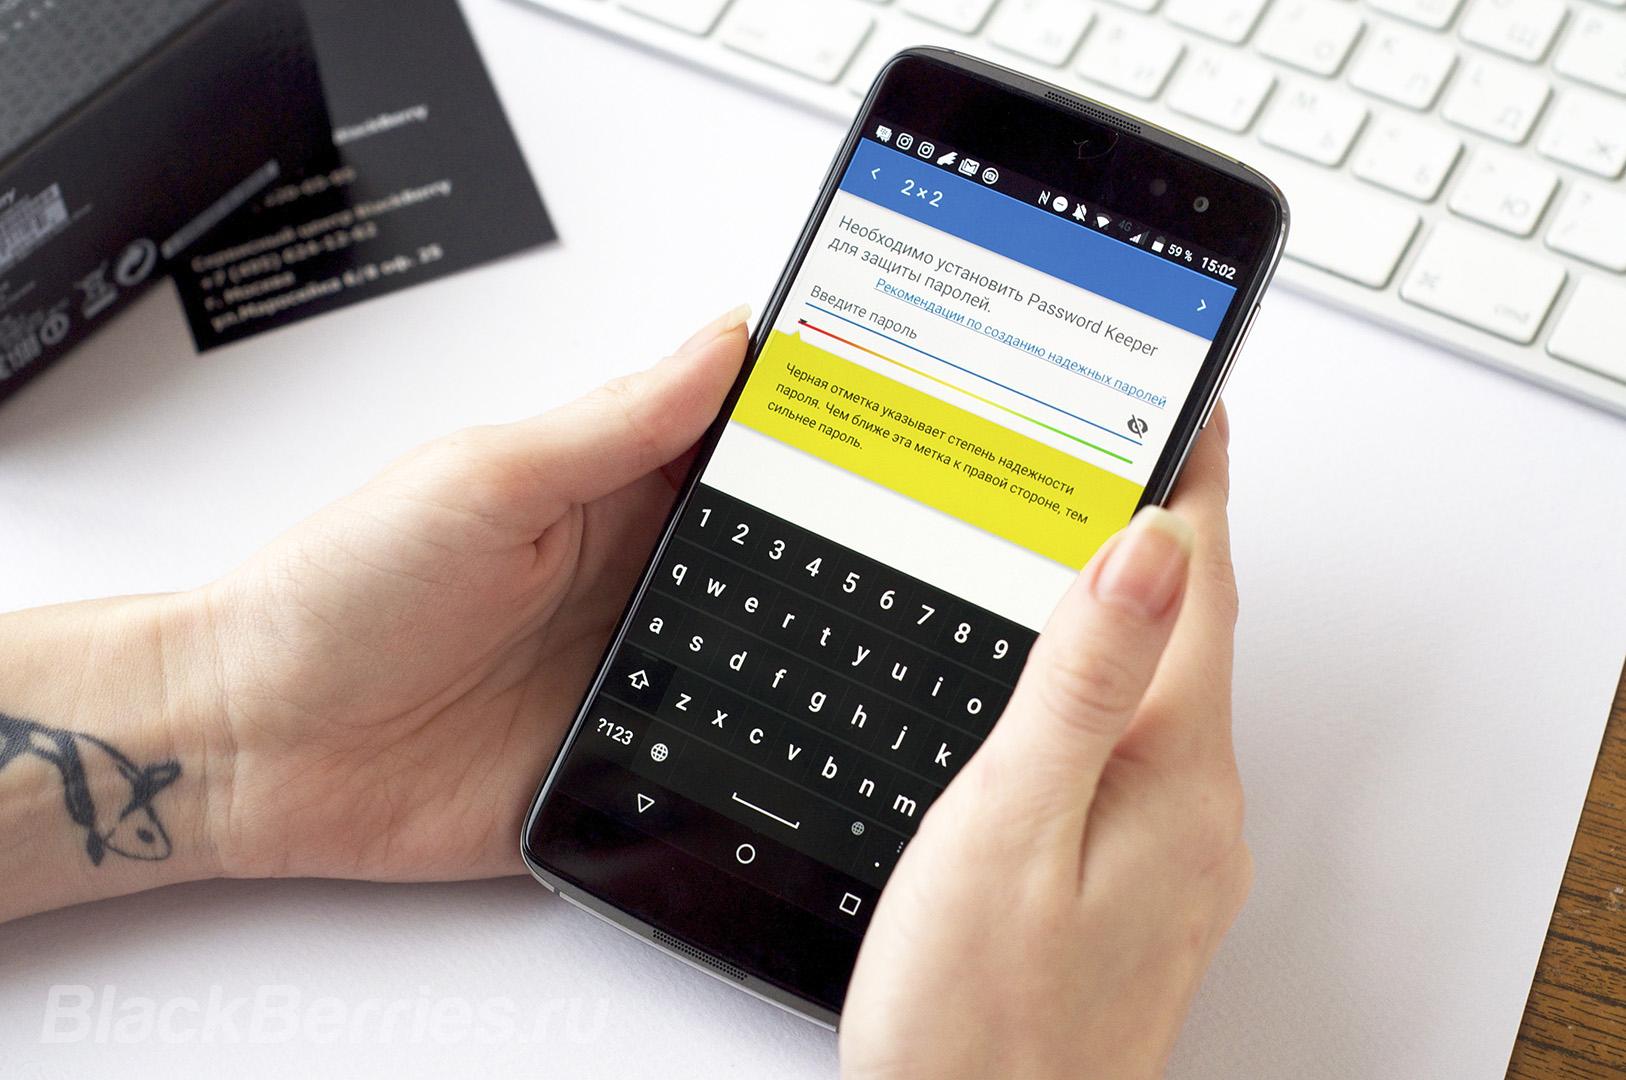 blackberry-dtek60-review-29